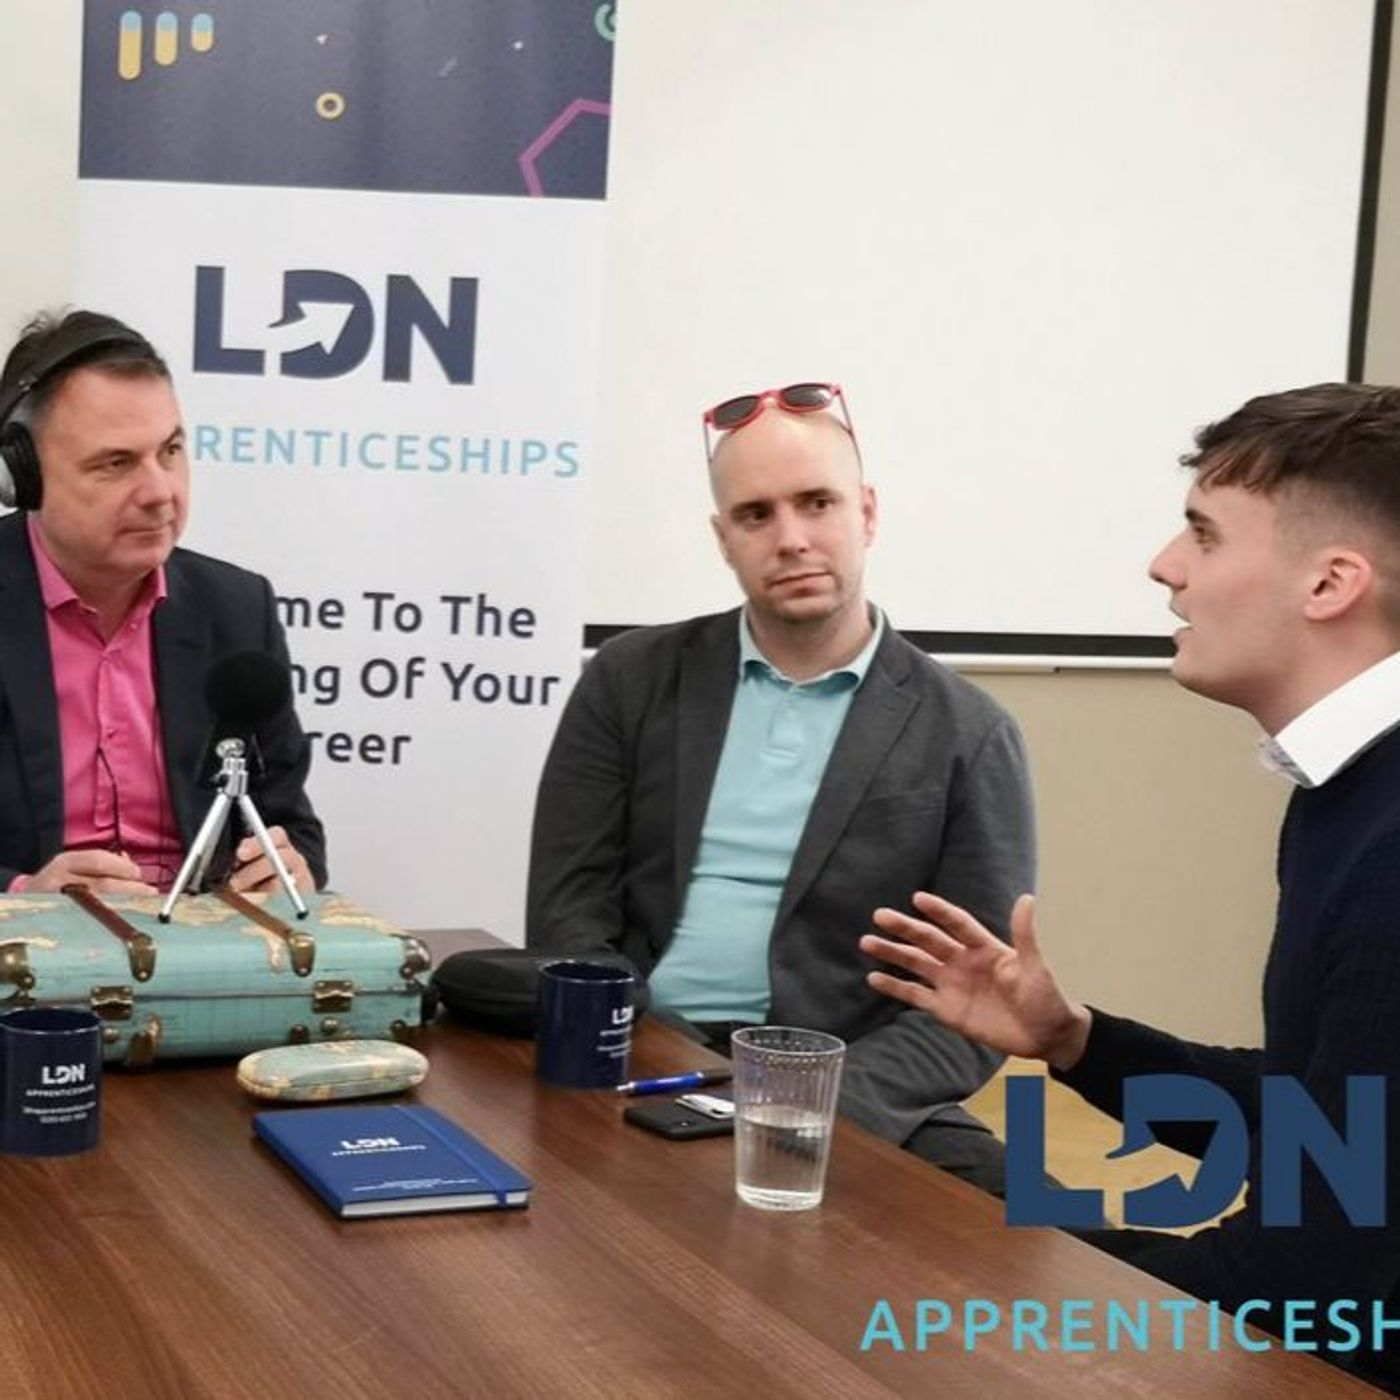 Tom talks to LDN Apprenticeships for #SkillsWorld